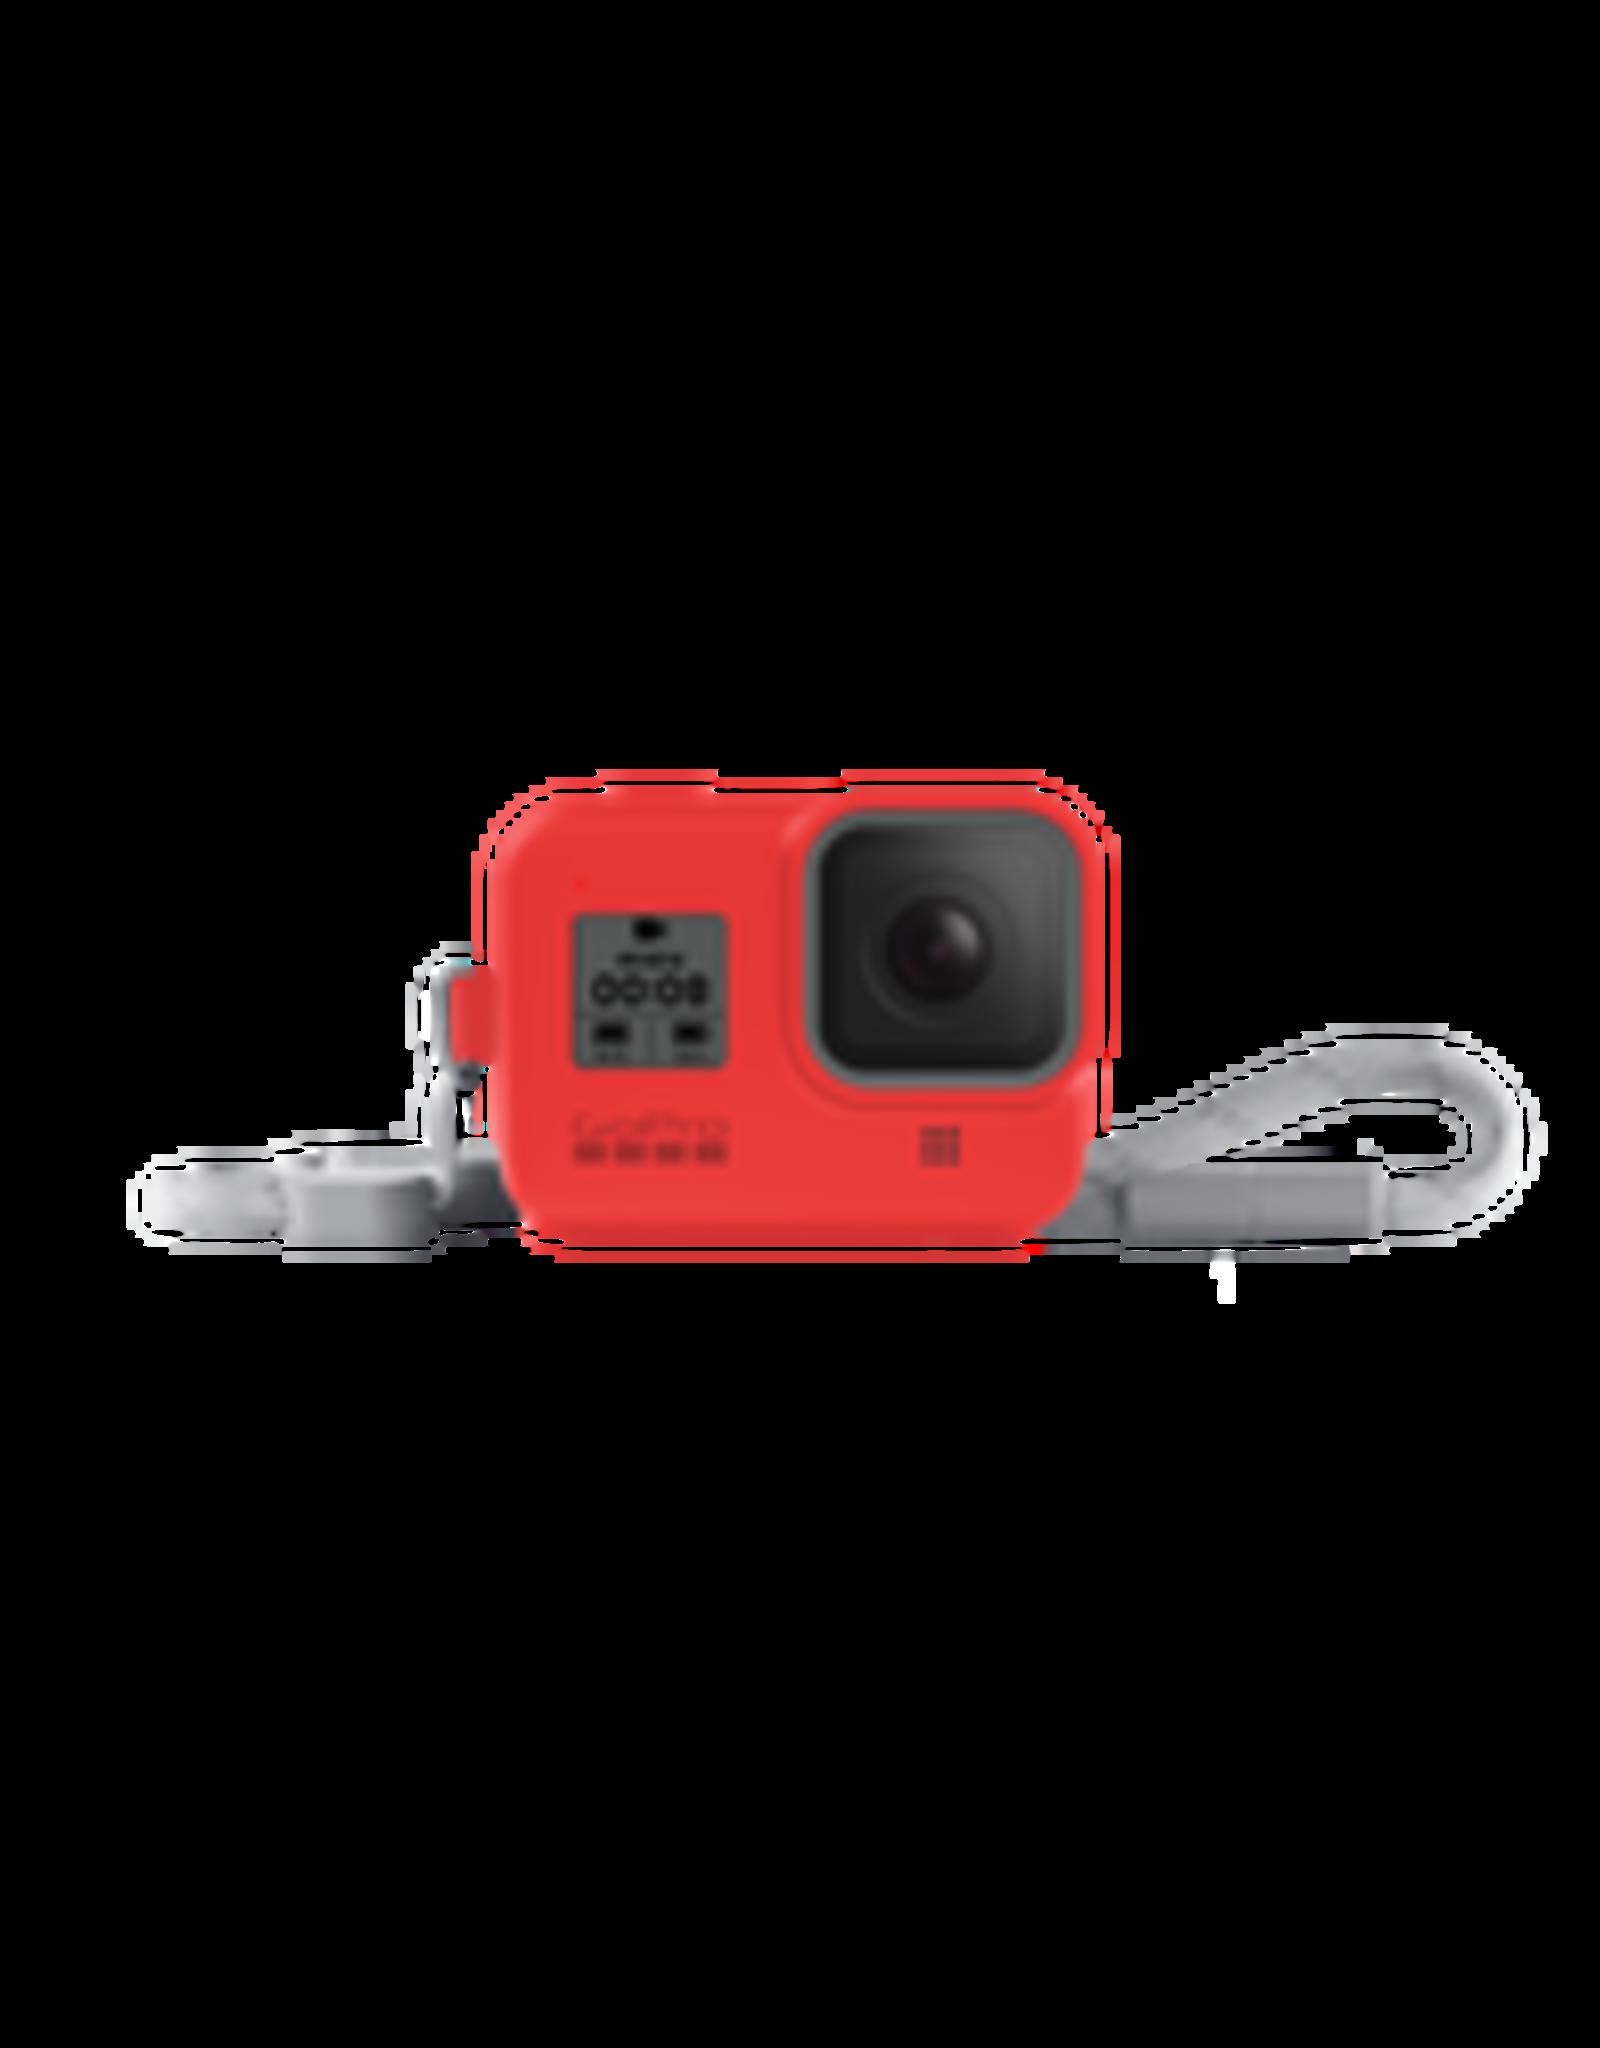 GoPro GoPro Sleeve + Lanyard (HERO8 Black) Firecracker Red